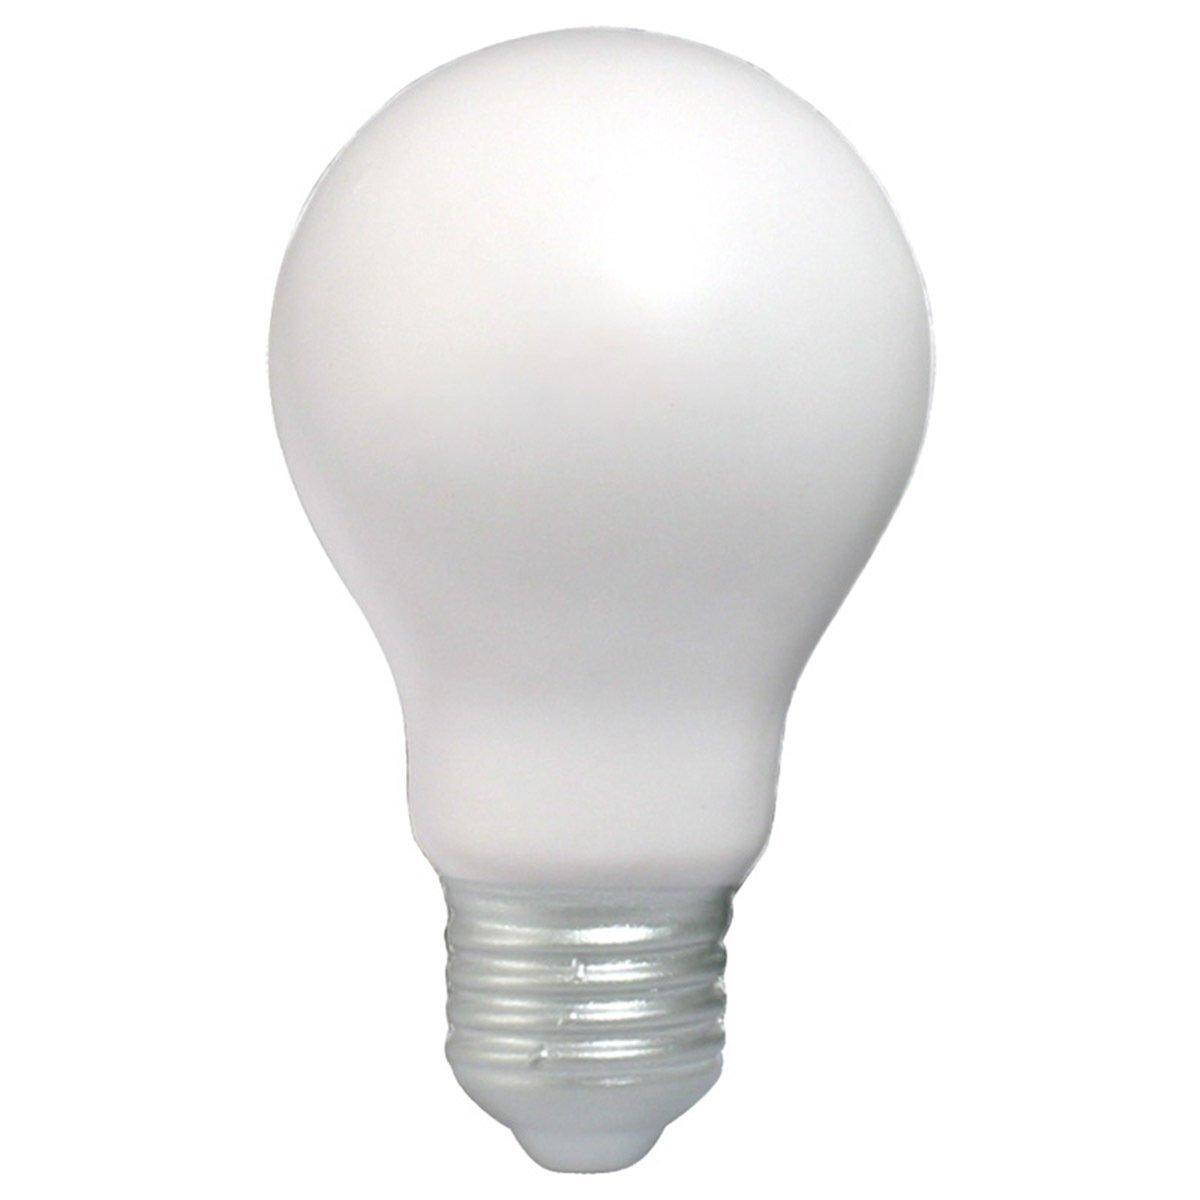 Lightbulb Stress Reliever